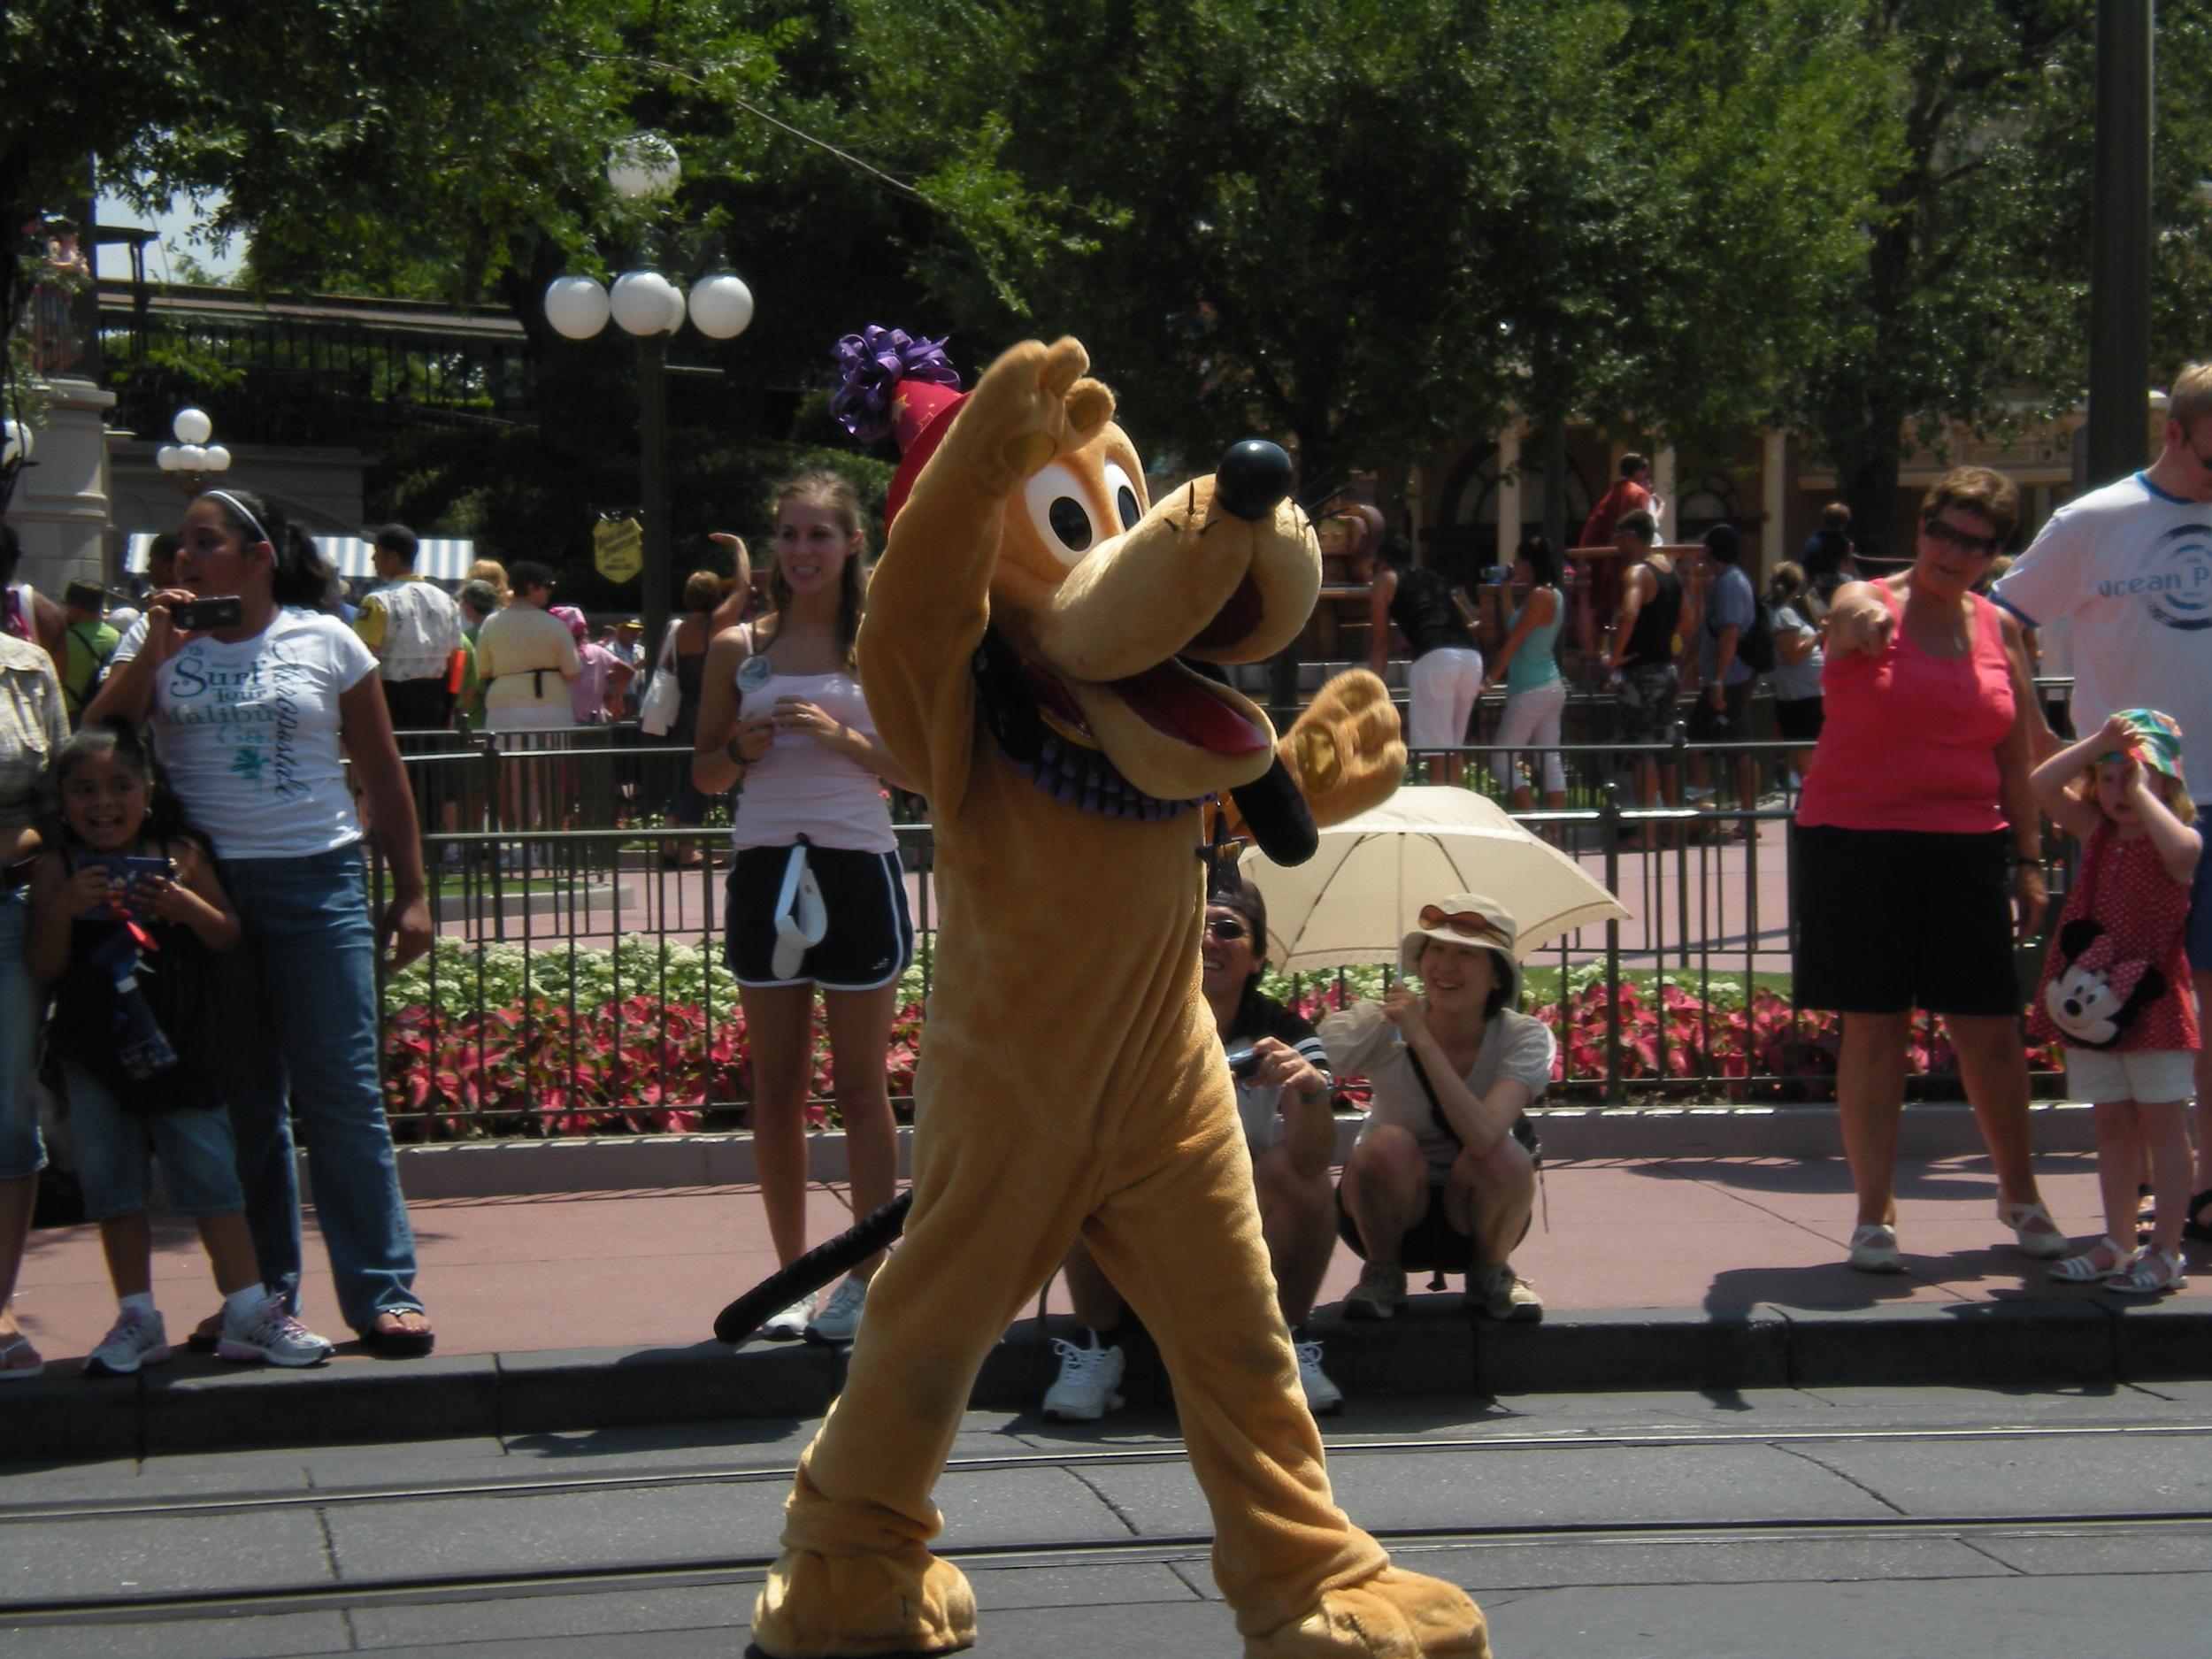 Dog -Pluto in Celebrate Today Parade at Magic Kingdom, WDW, Florida